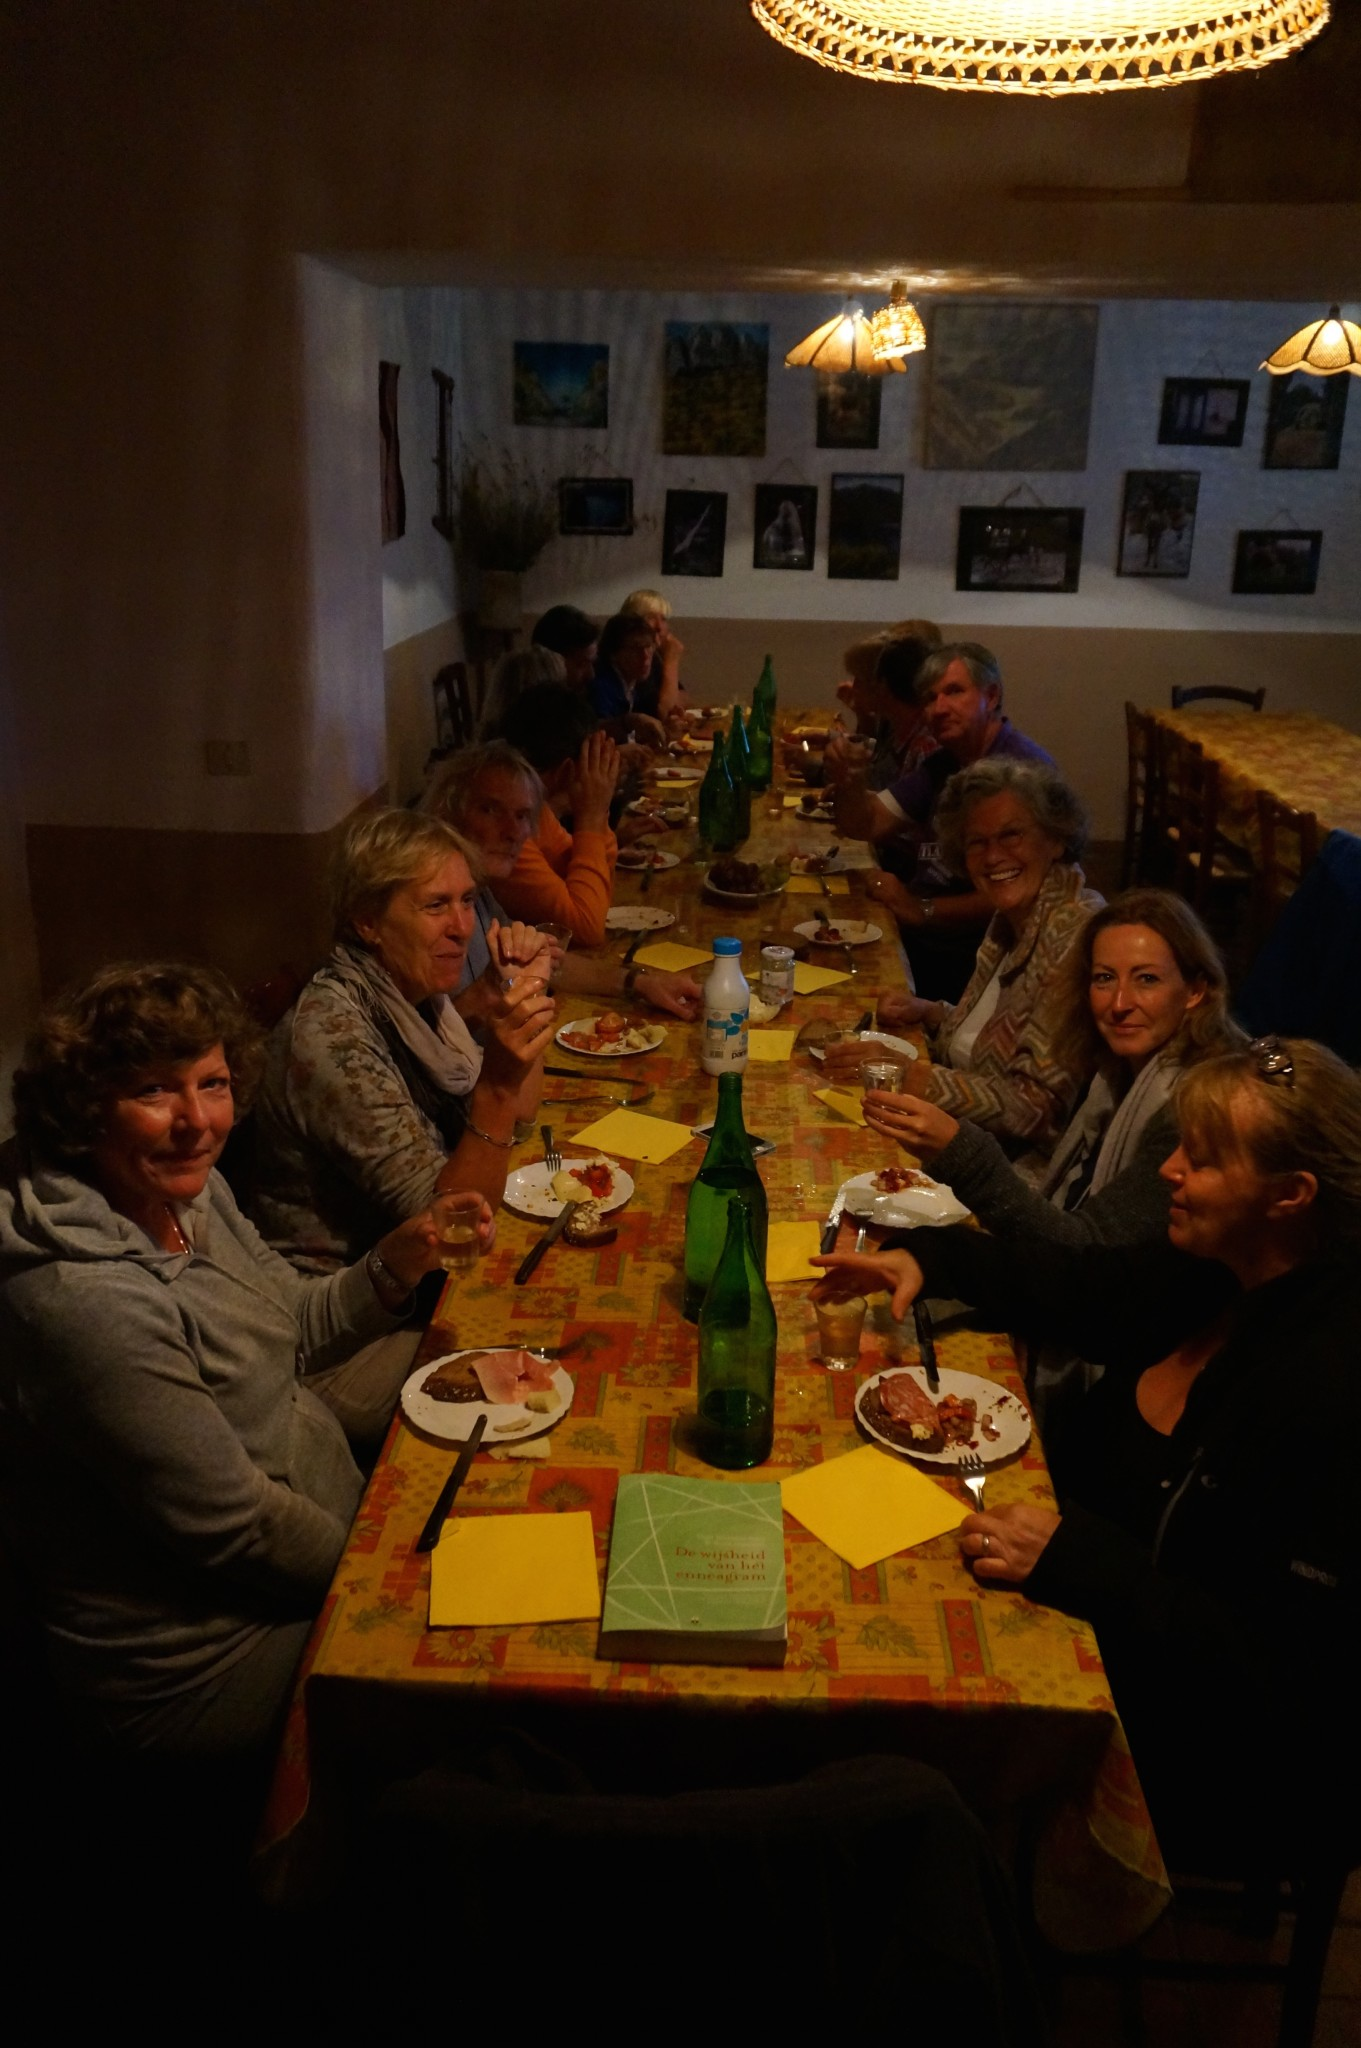 diner met 17 man